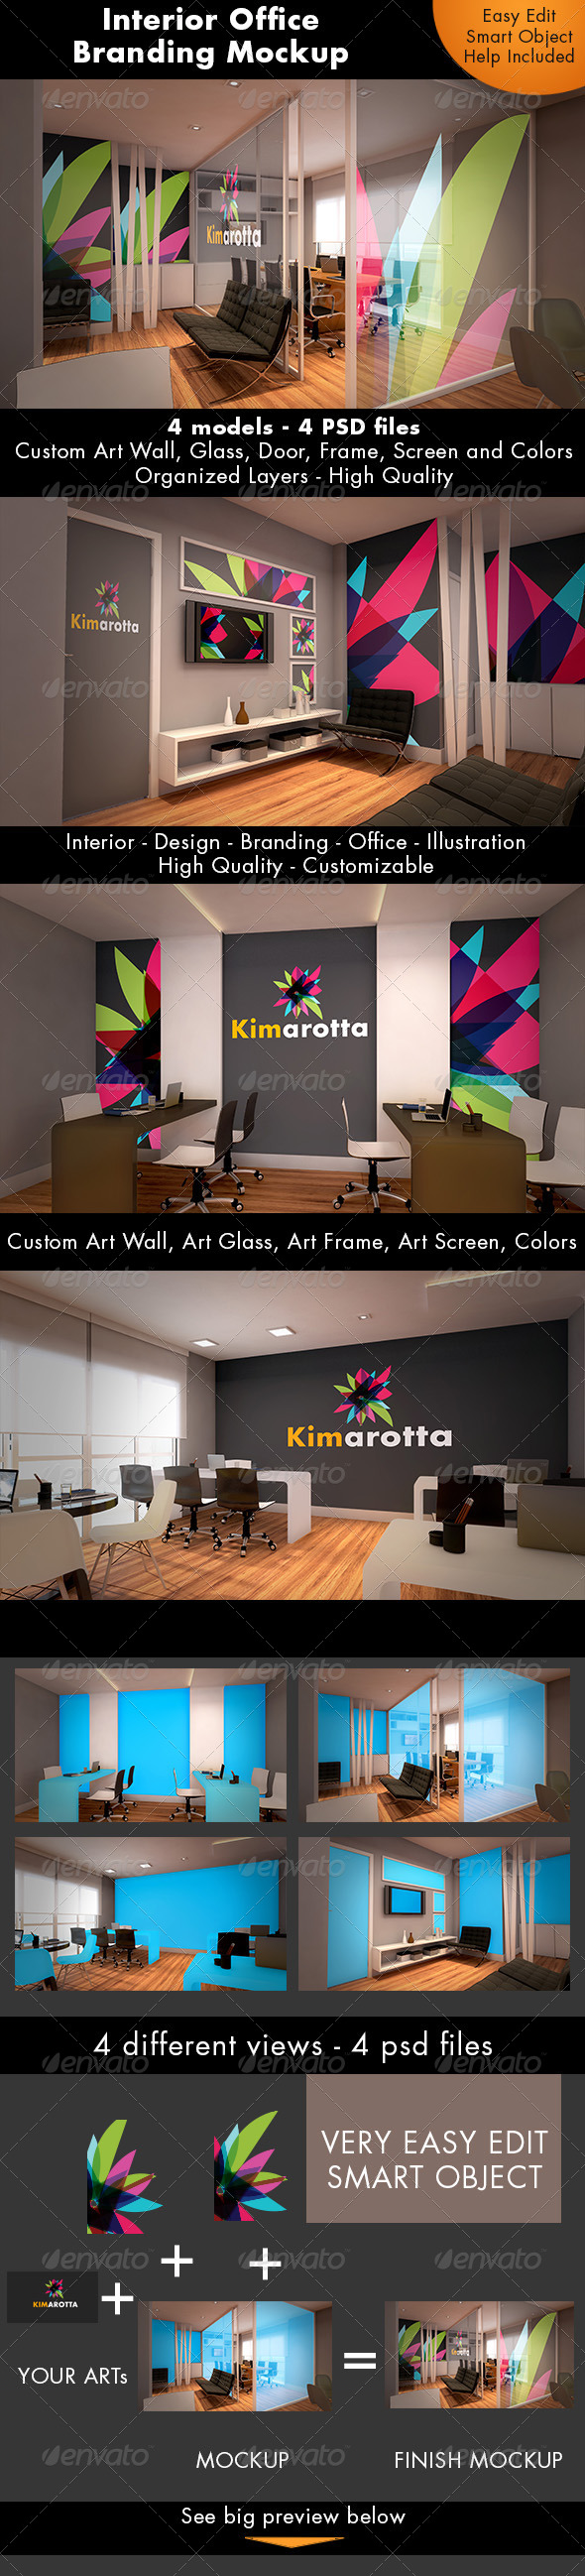 GraphicRiver Interior Office Branding Mockup 7352993